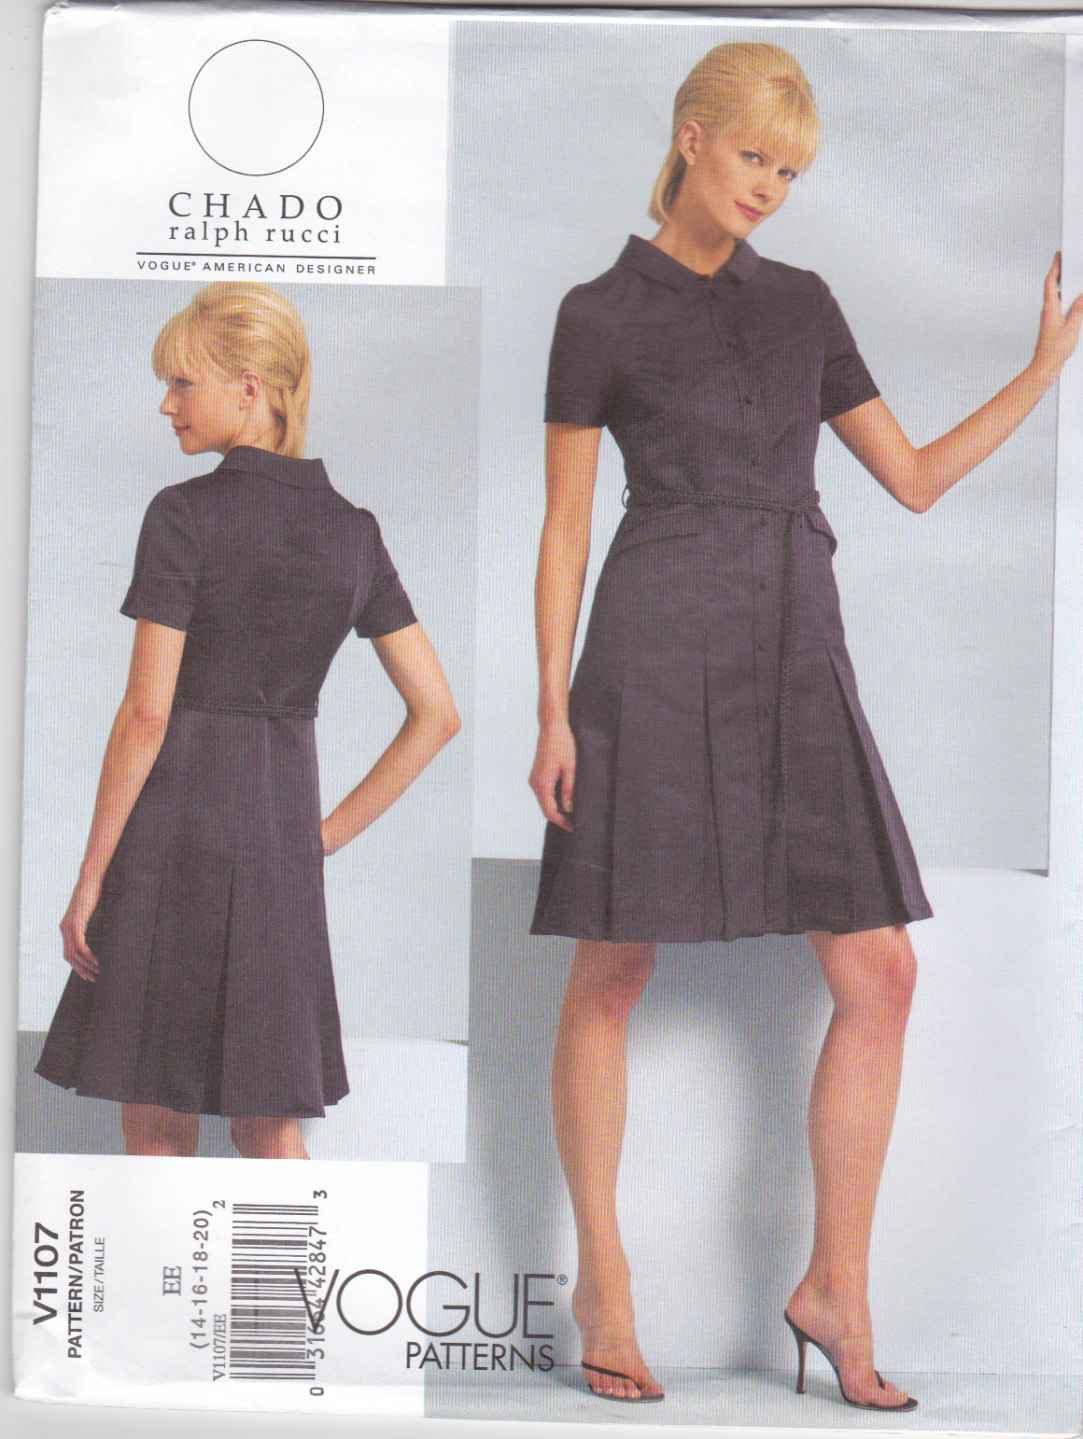 Vogue Sewing Pattern 1107 V1107 Misses Sizes 14-20 CHADO Ralph Rucci Dress Belt Seam Details